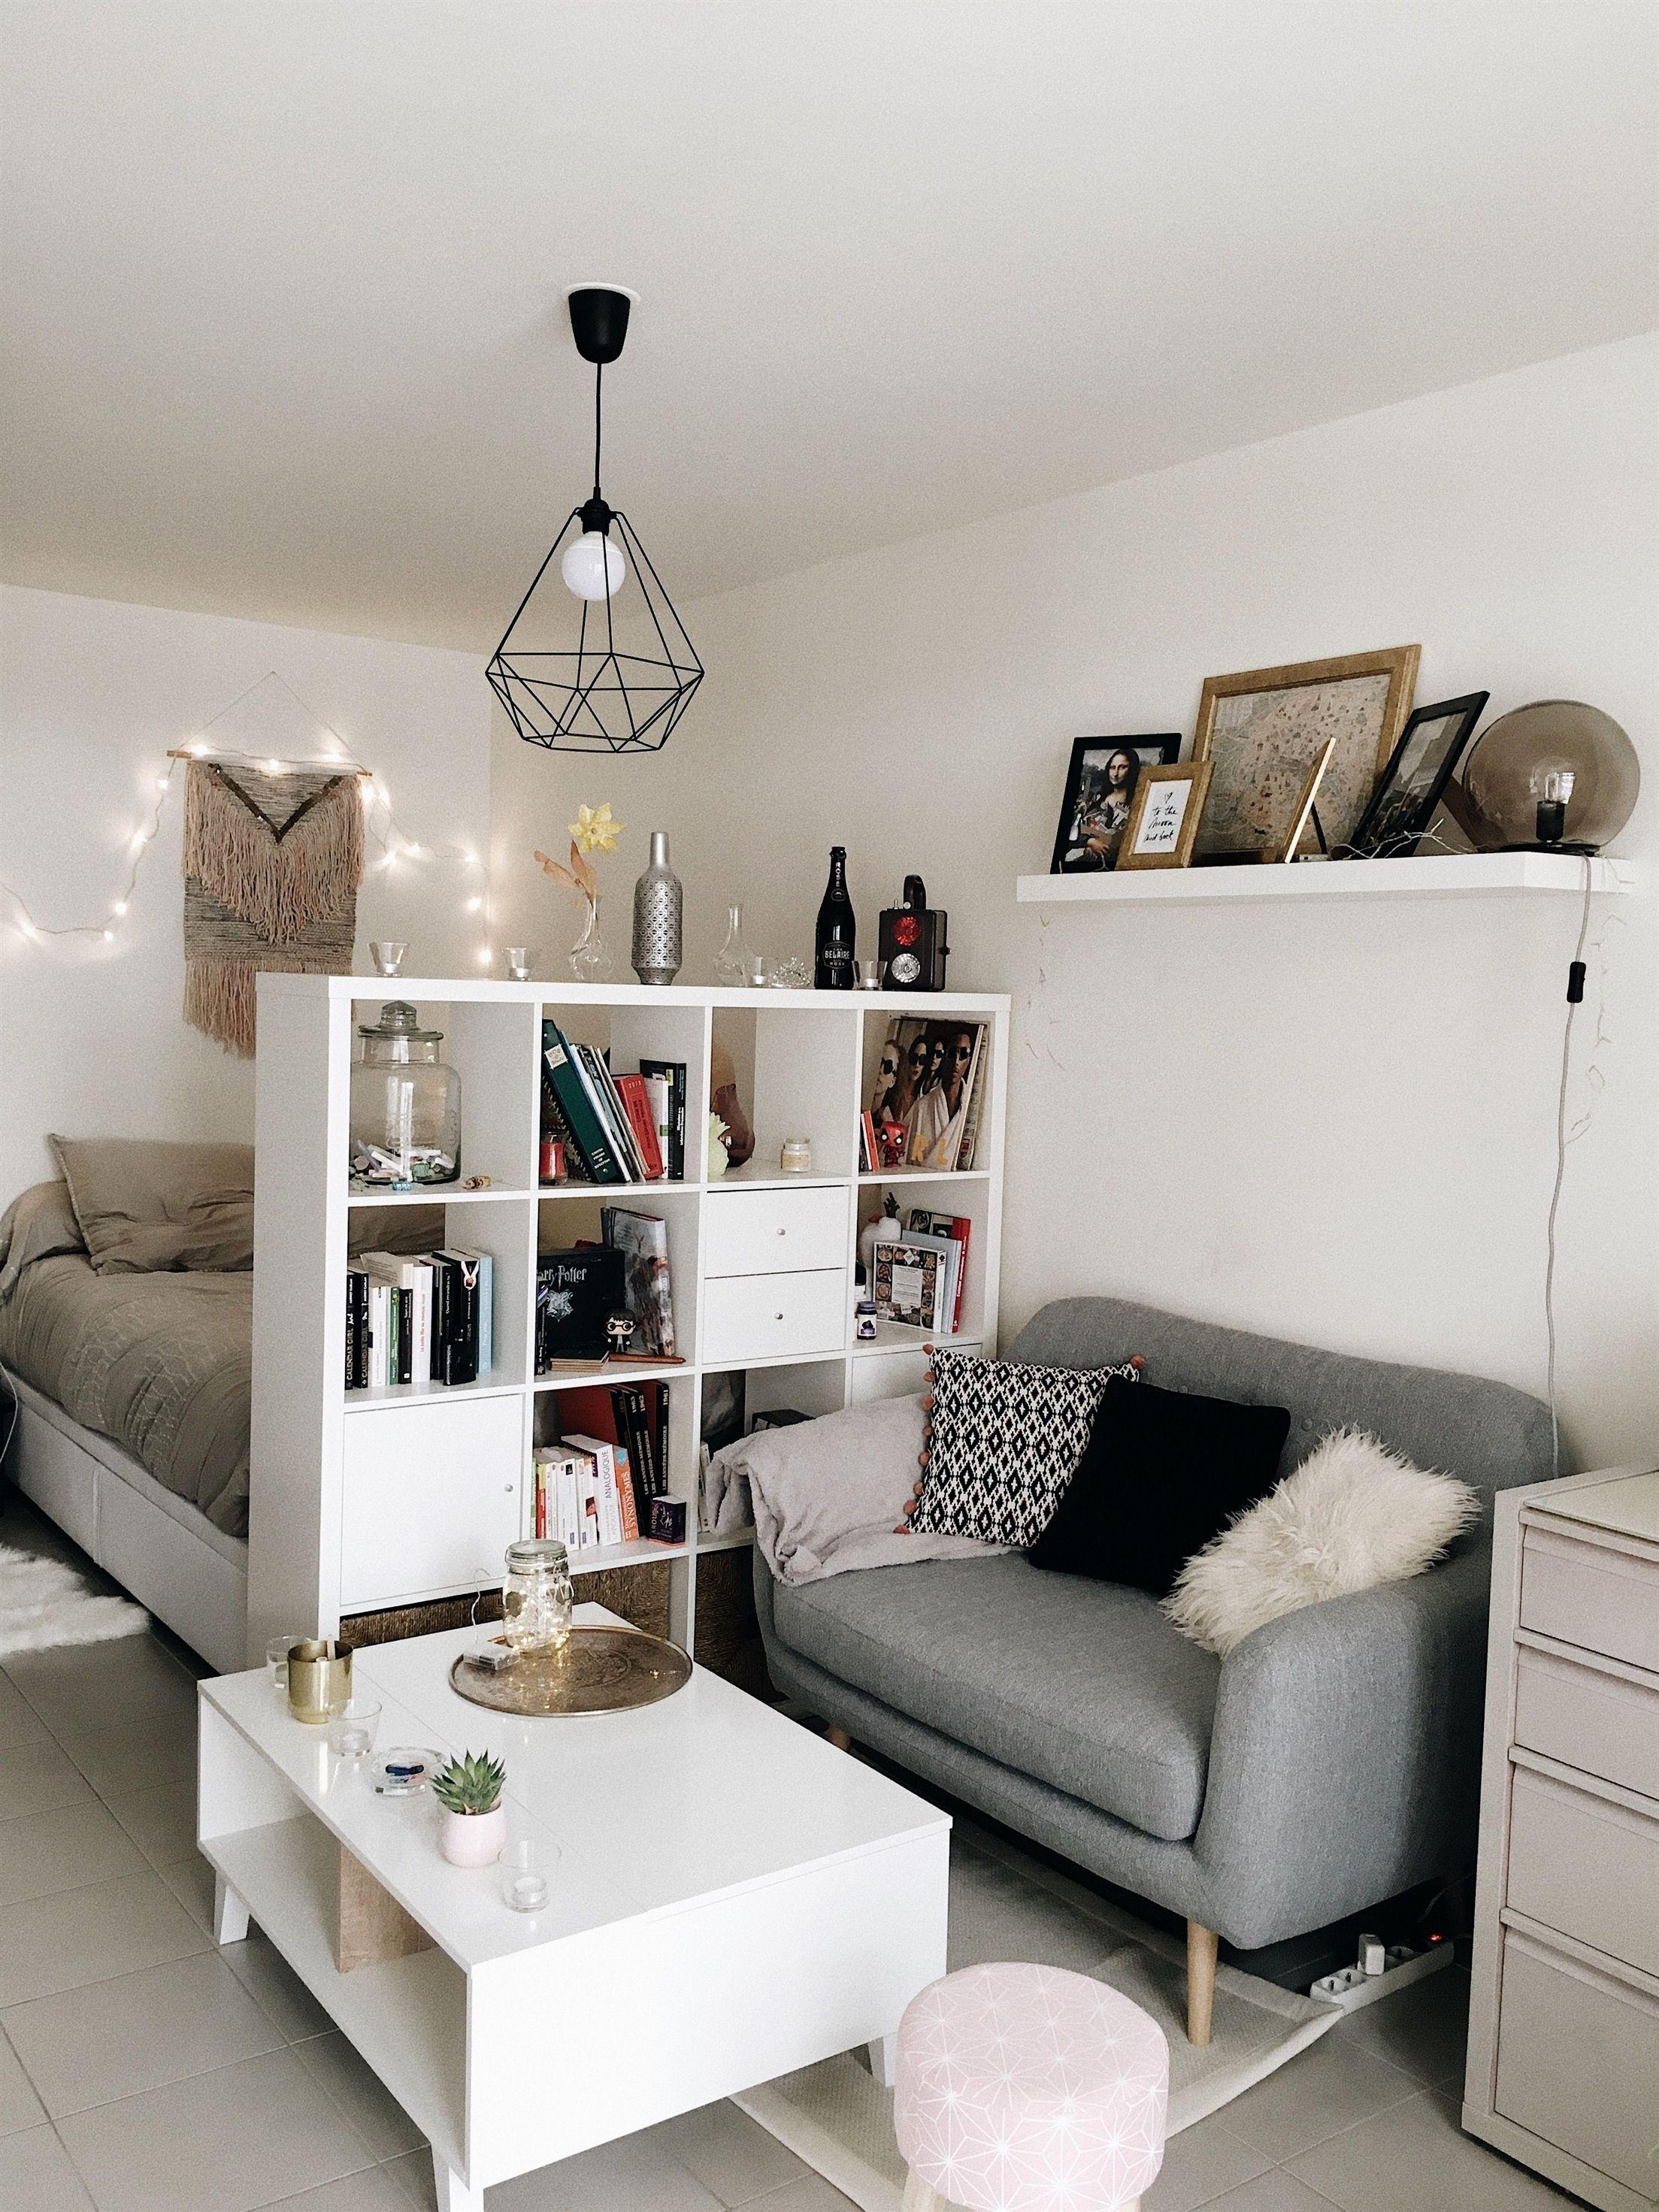 Bedroomdecorideas Decor In 2019 Room Decor Studio Apartment